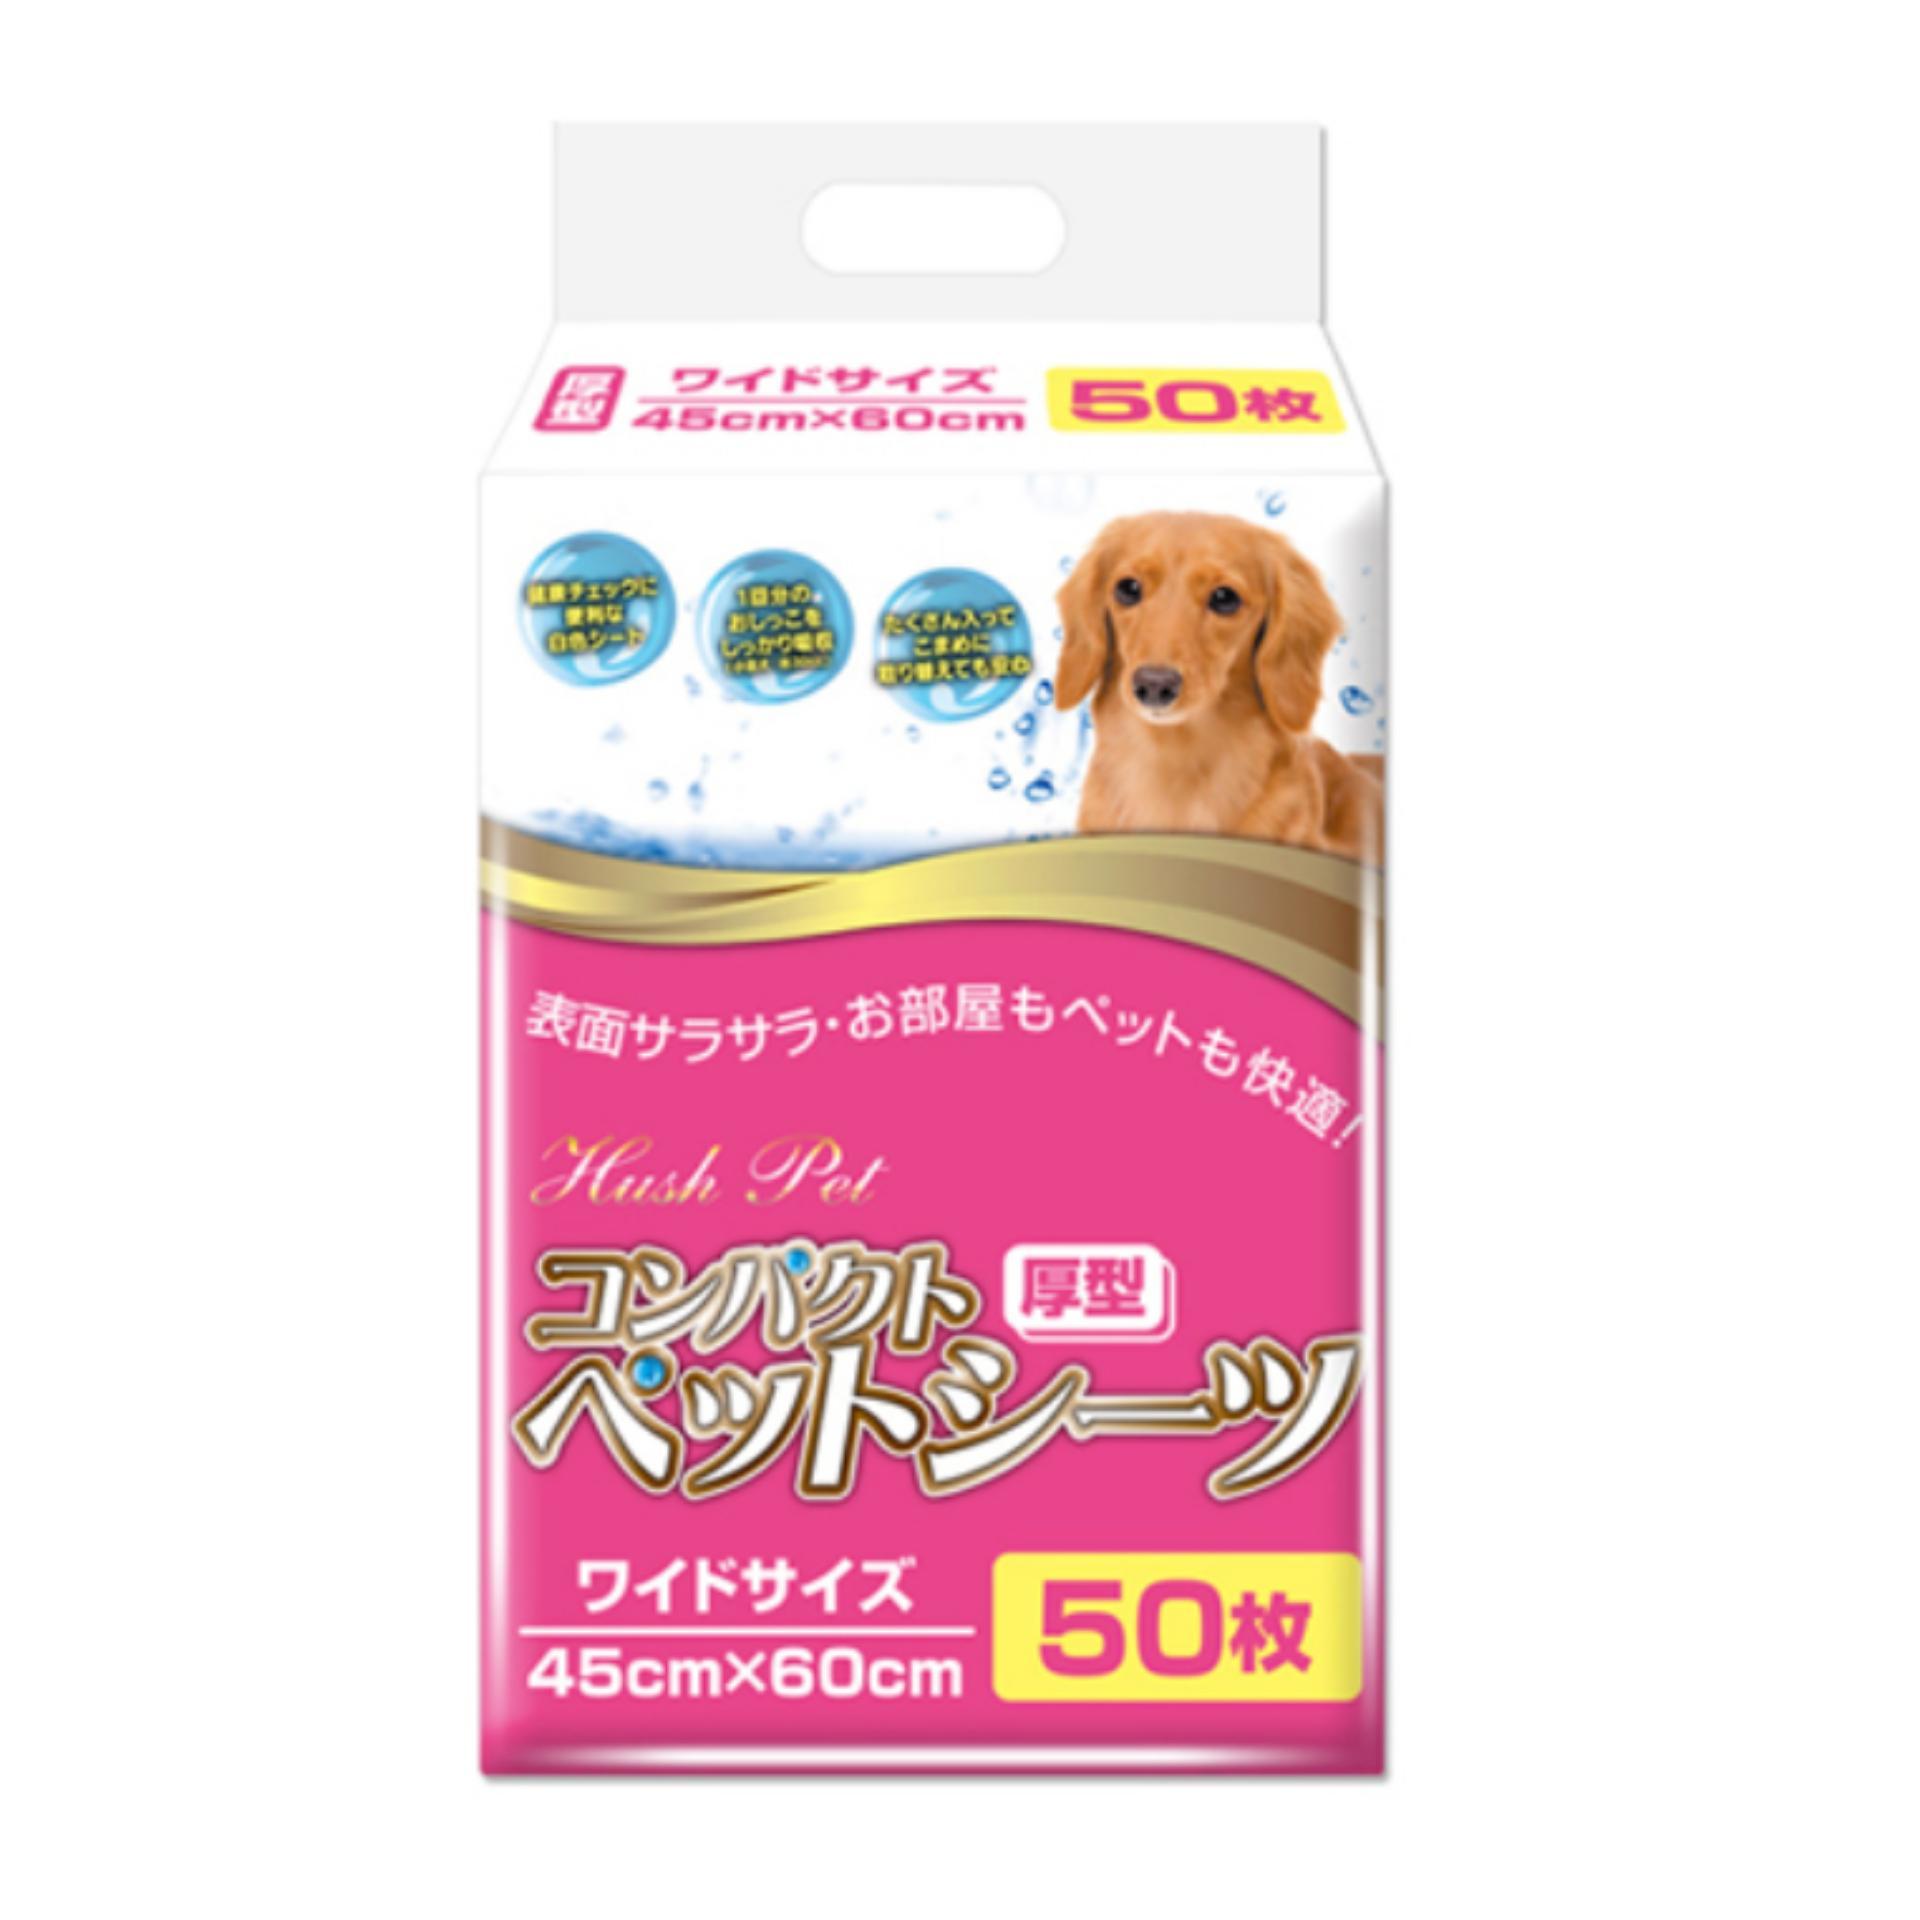 Hushpet Sheets 50 Pieces Pet Puppy Training Pee Pads ( Medium ) 45 Cm X 60 Cm By Smooch Pooch Discount Center.